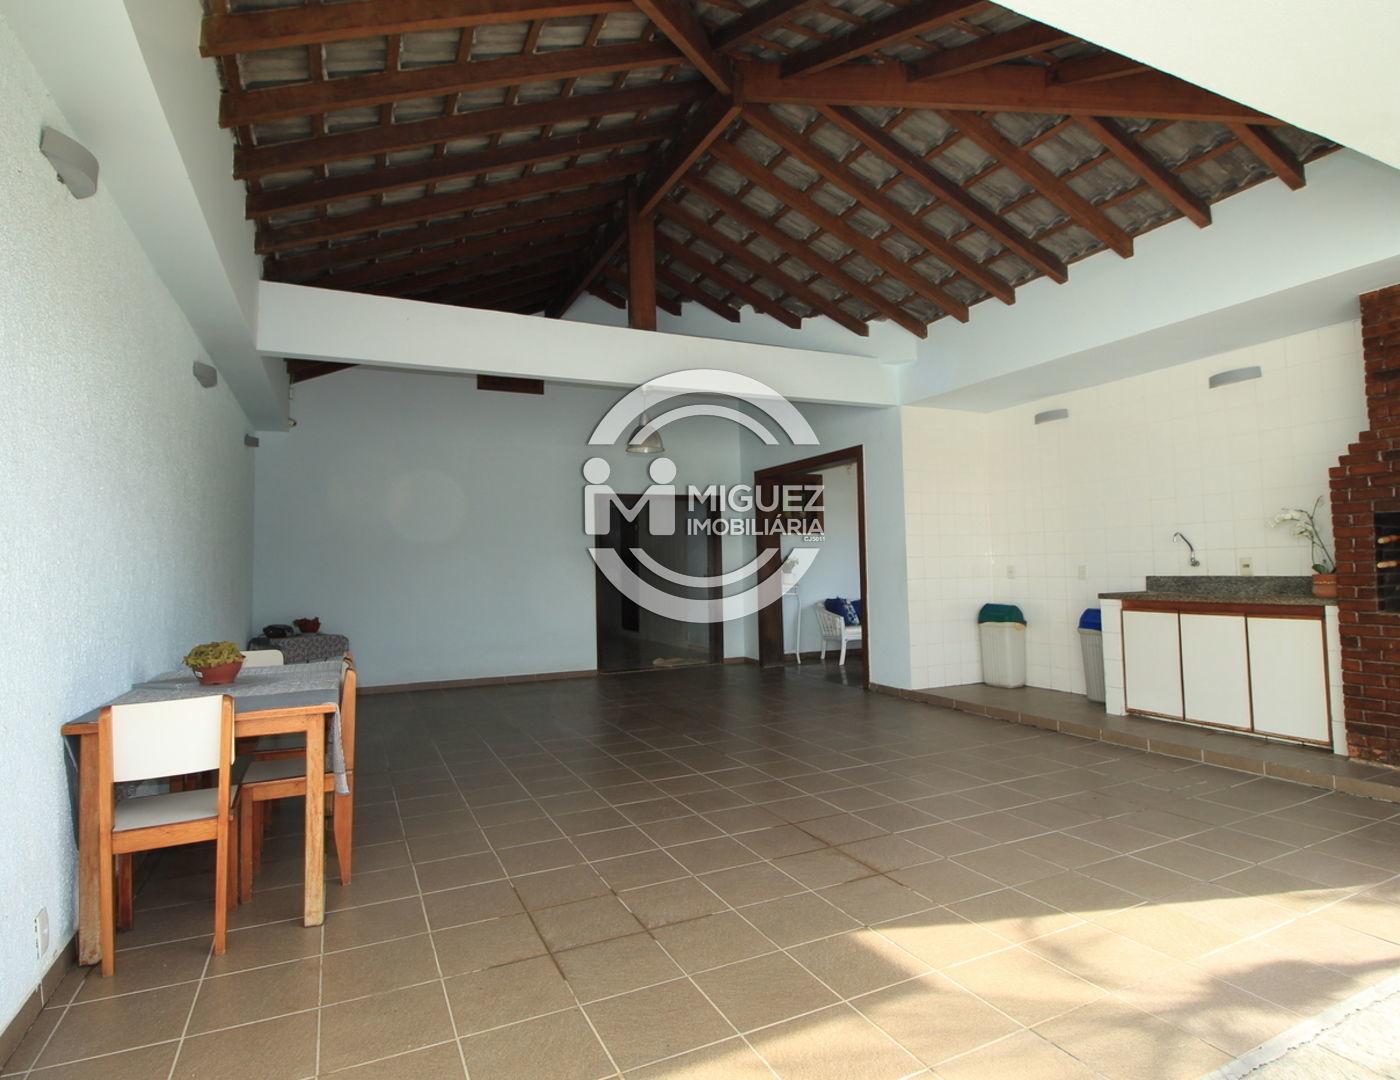 Casa, aluguel, Rua Levi Carneiro - Barra da Tijuca , Rio de janeiro